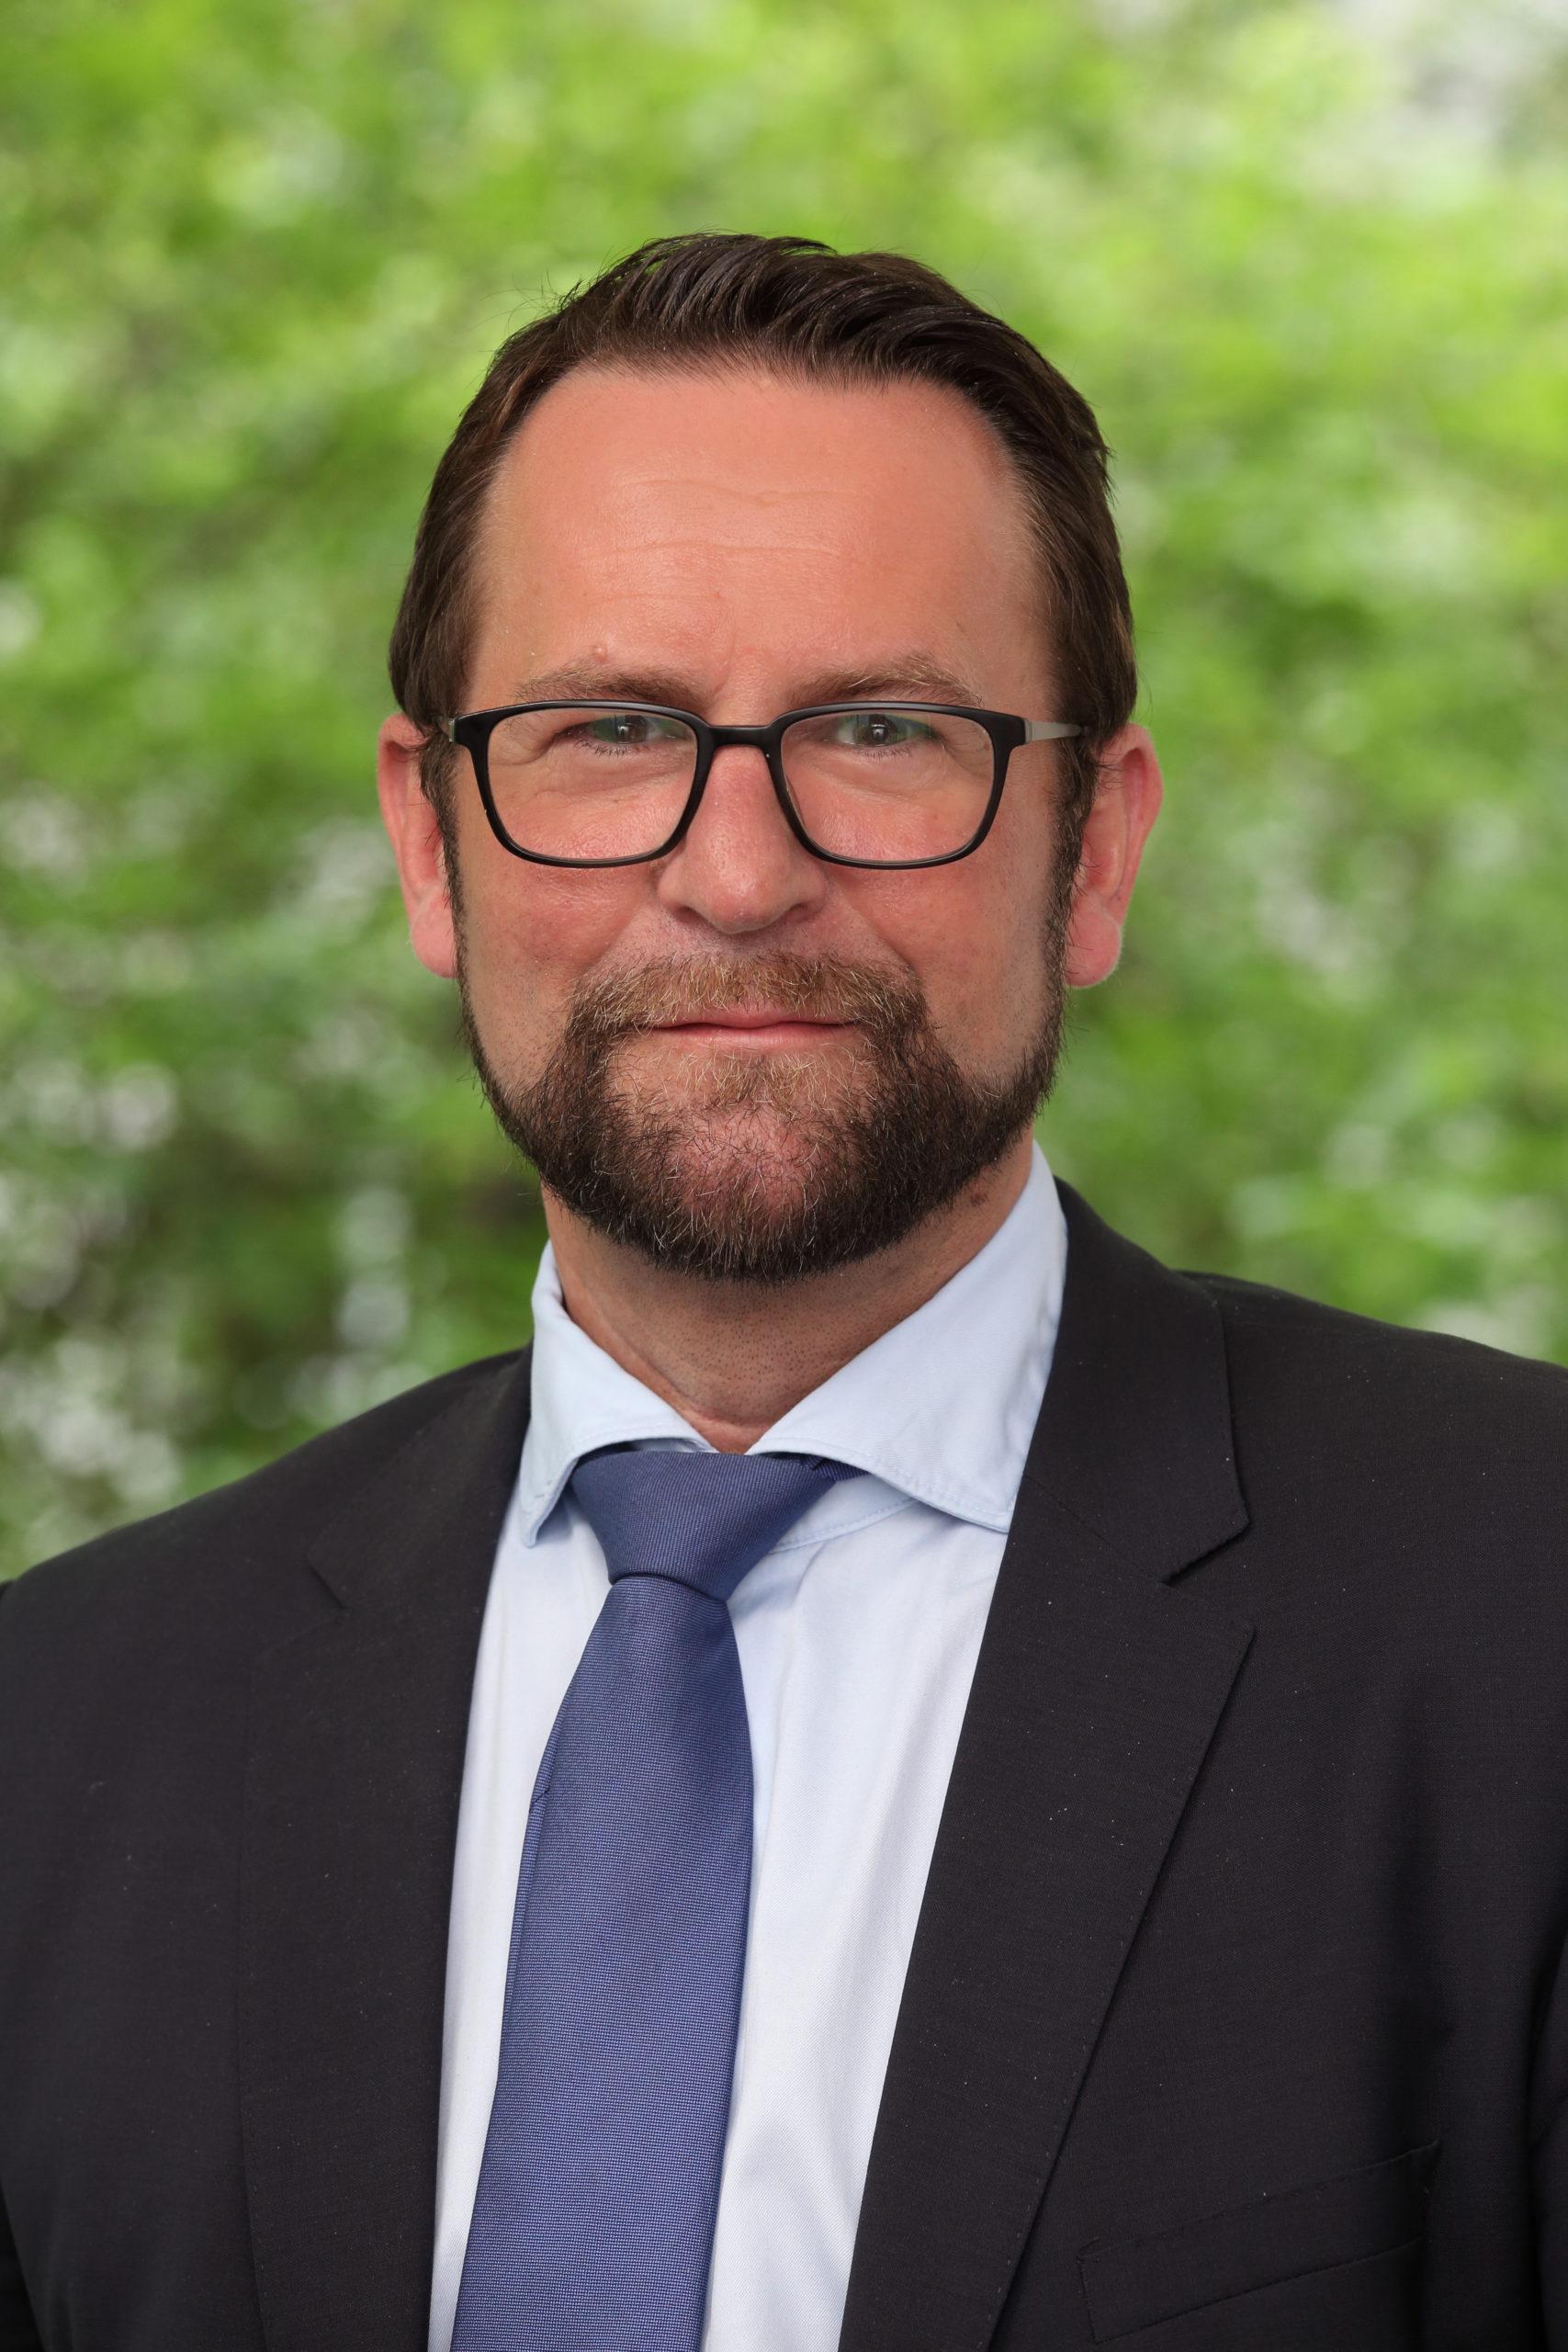 Gunnar Borchardt